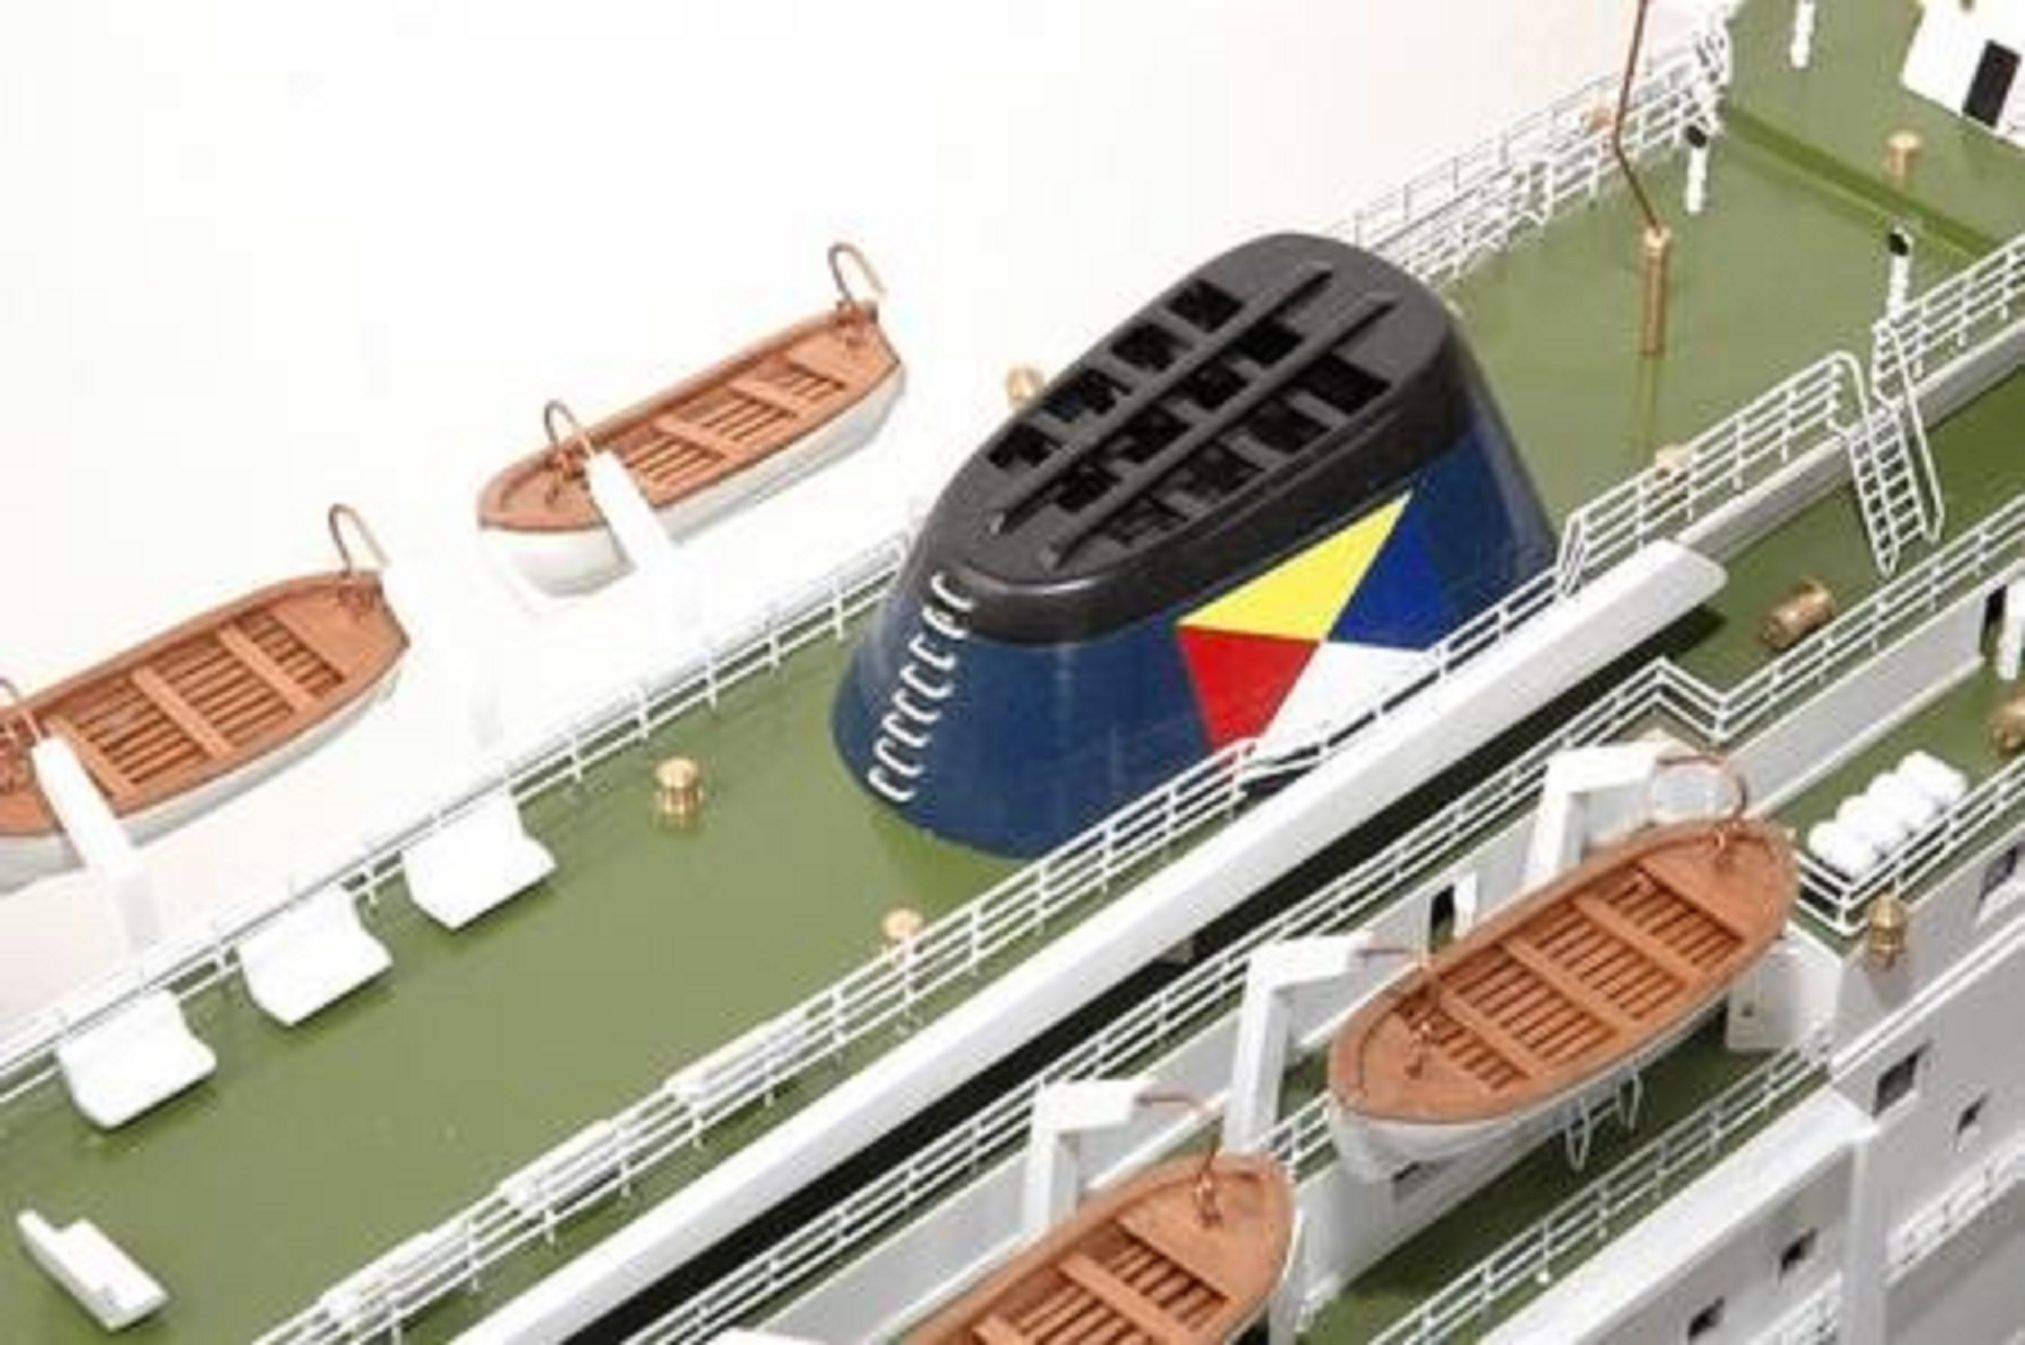 293-7551-P-O-model-ships-Pride-Aisla-and-Rathlin-Premier-Range